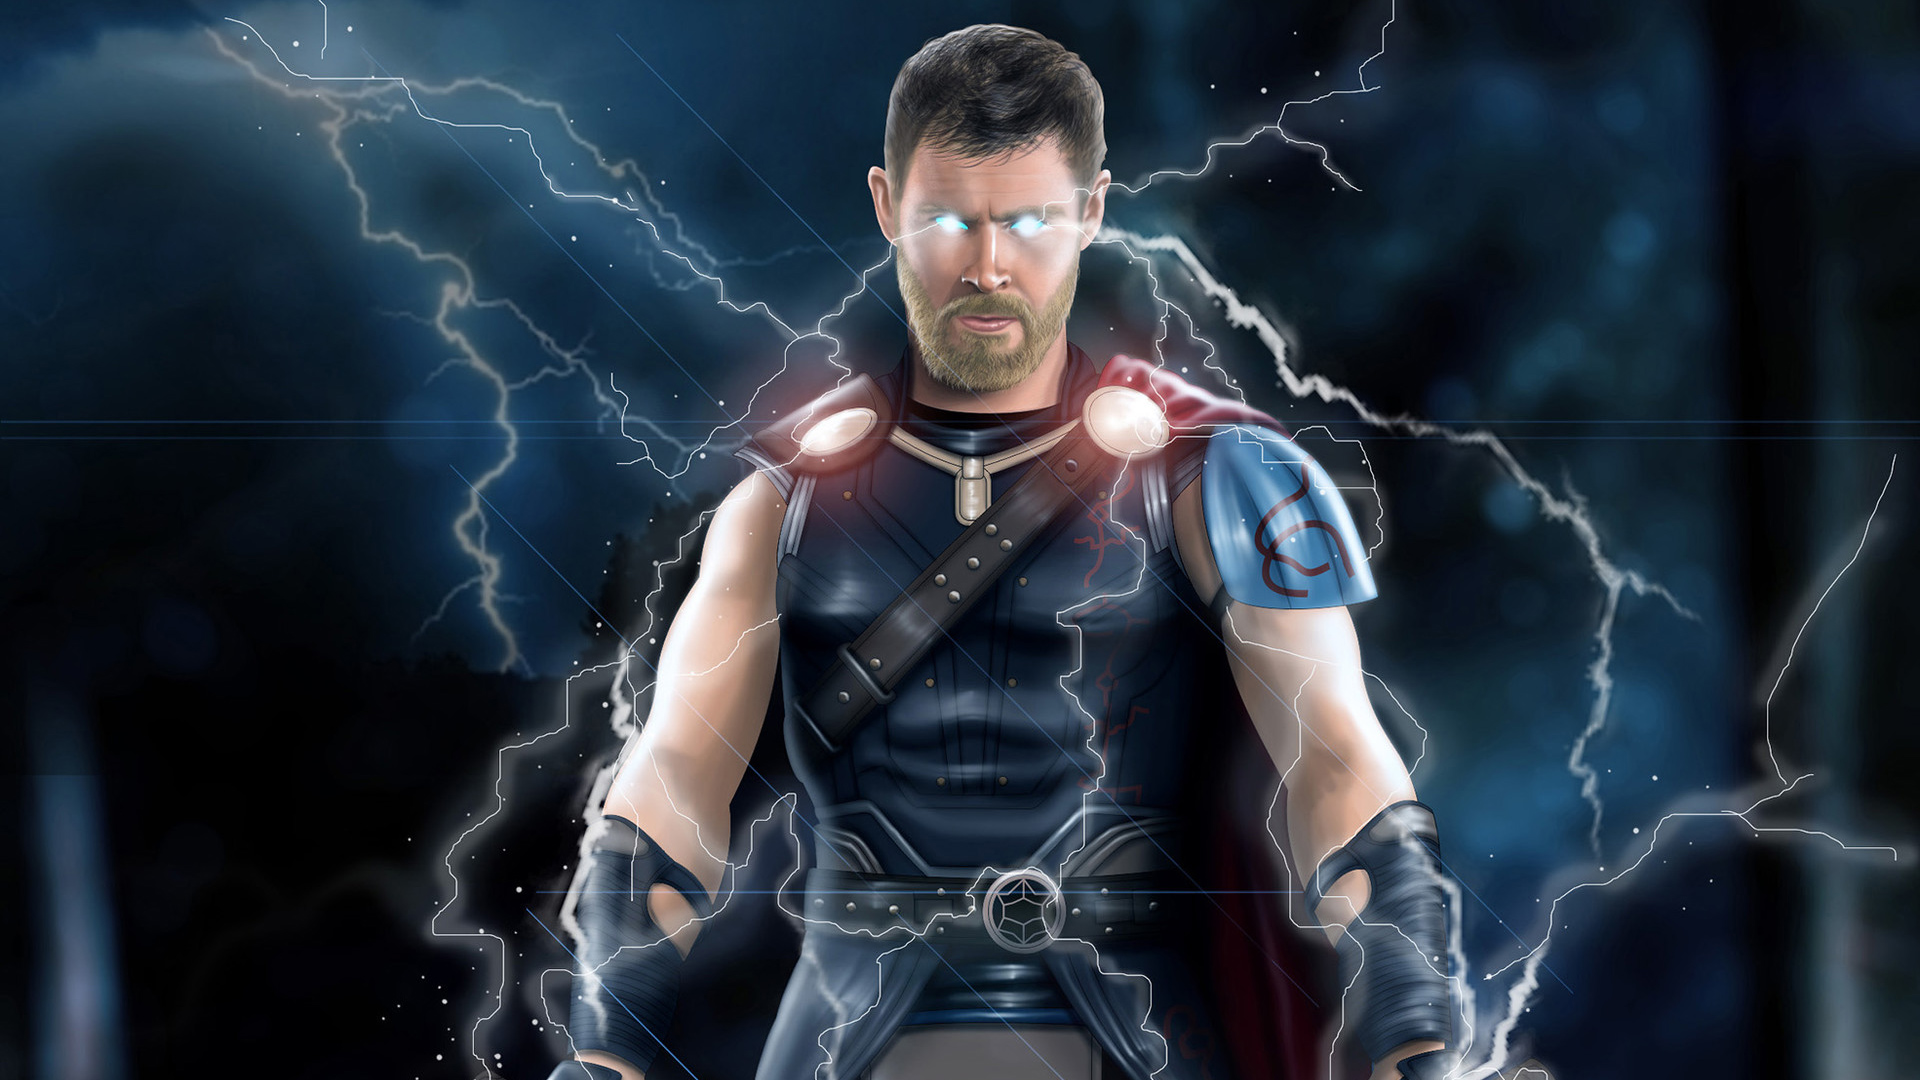 Thor ragnarok movie artworks hd superheroes 4k - Thor ragnarok hd wallpapers download ...